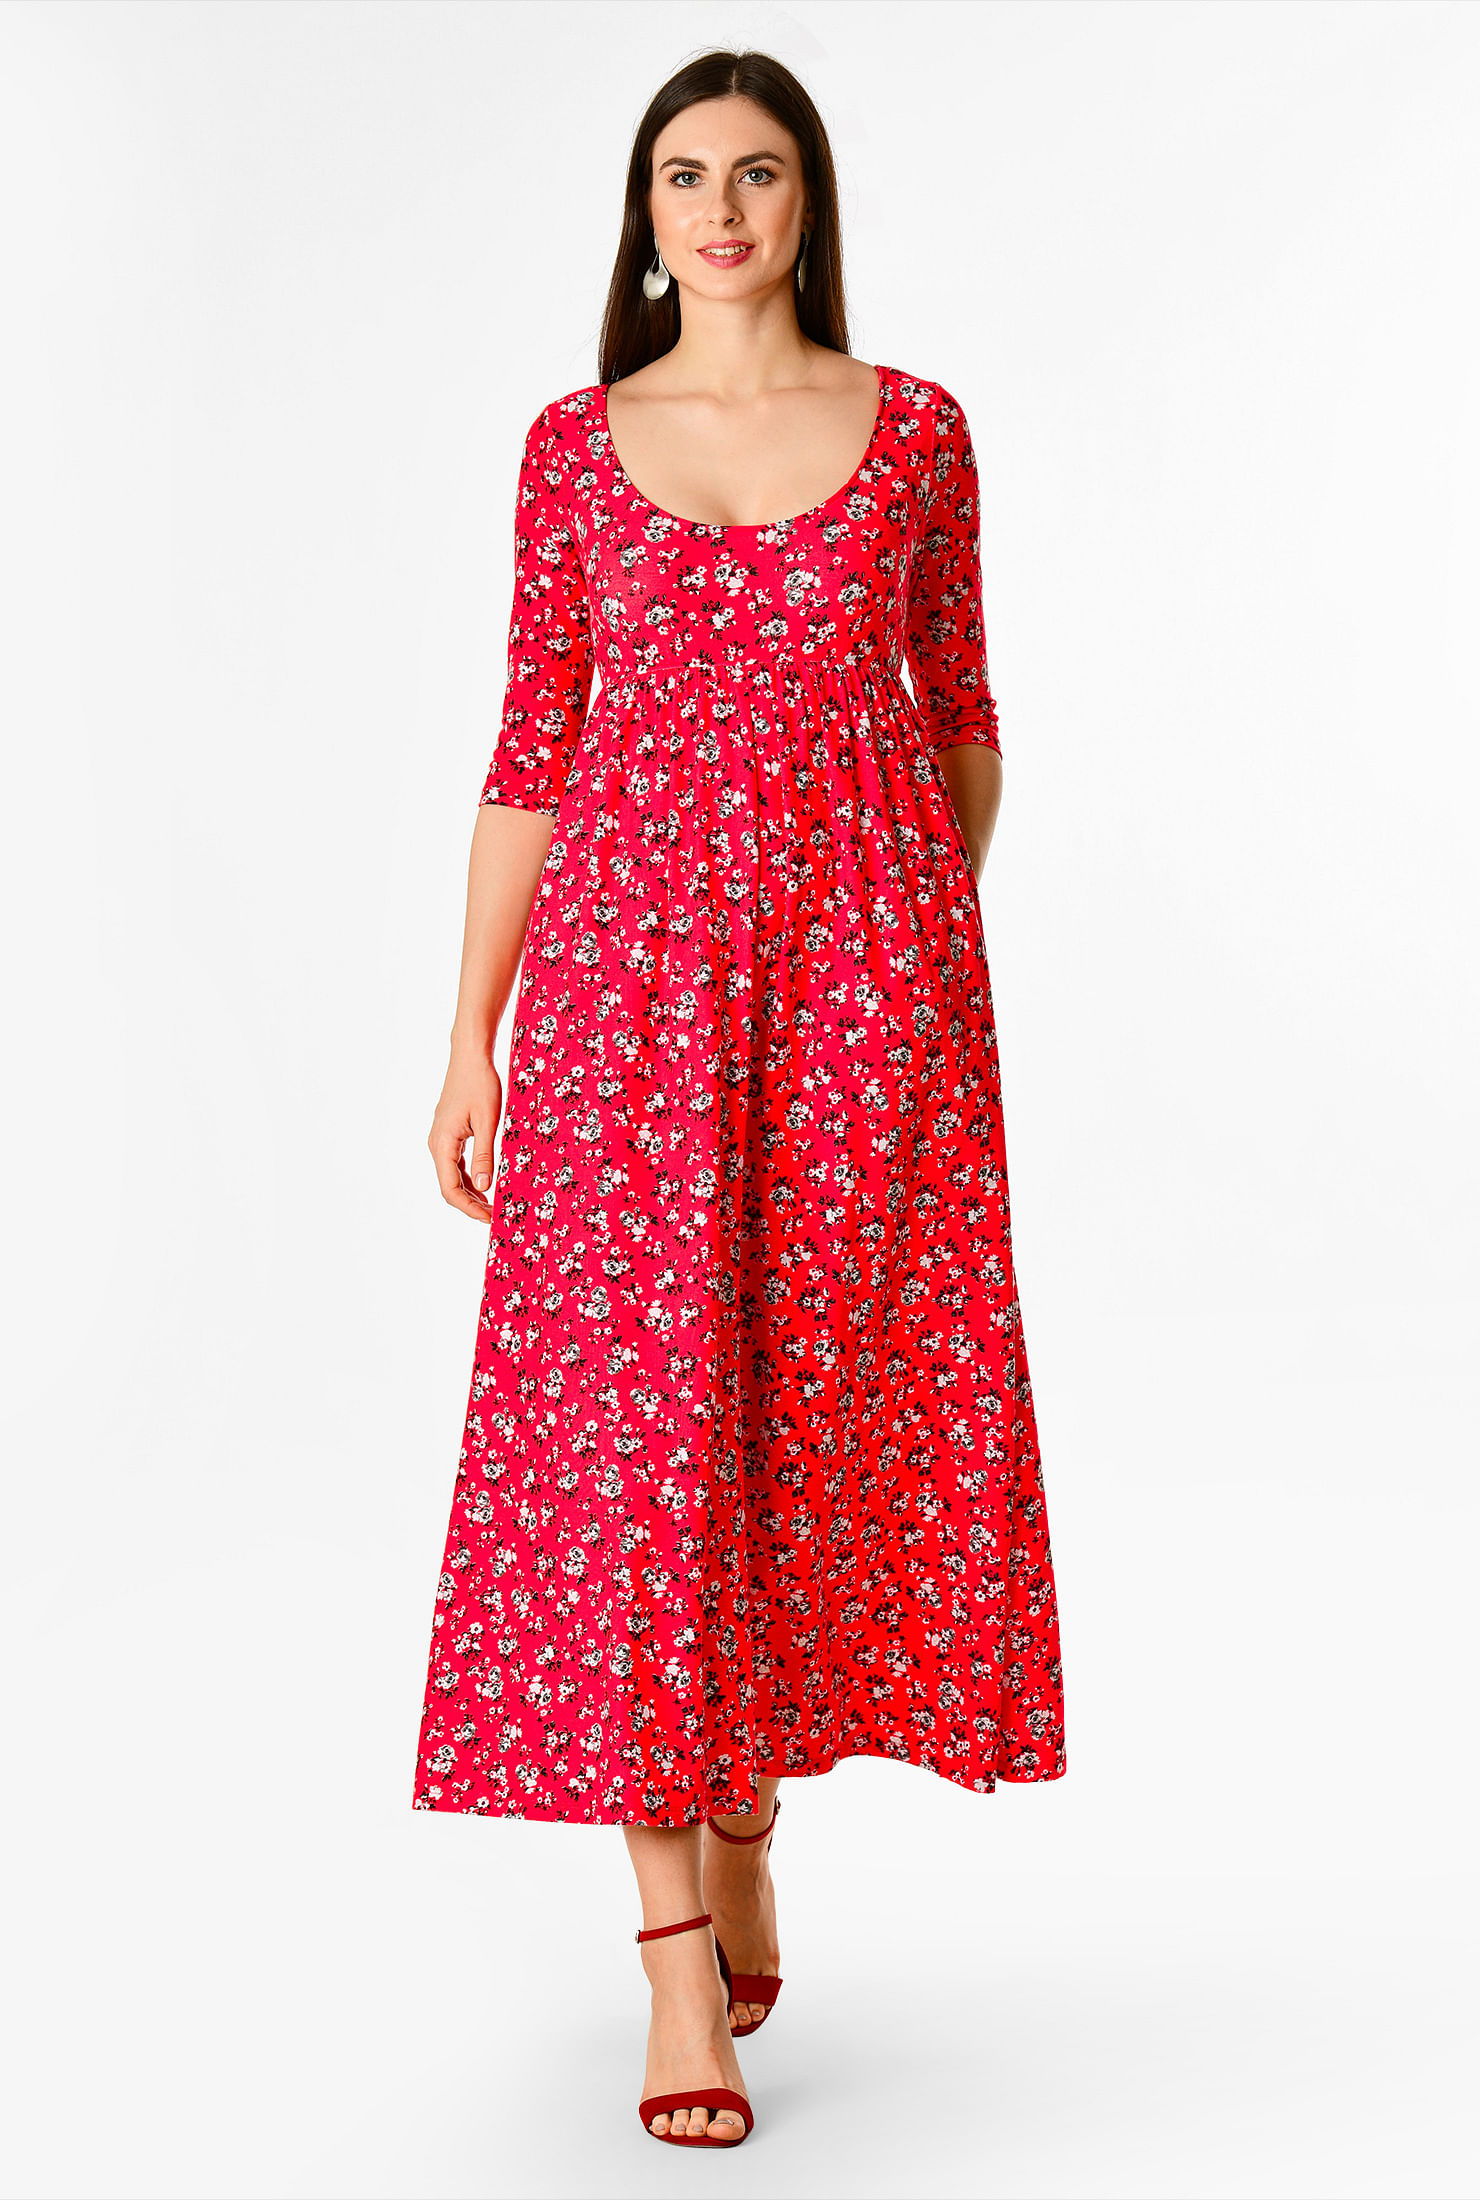 0bbd3d5257ccbc Women's Fashion Clothing 0-36W and Custom